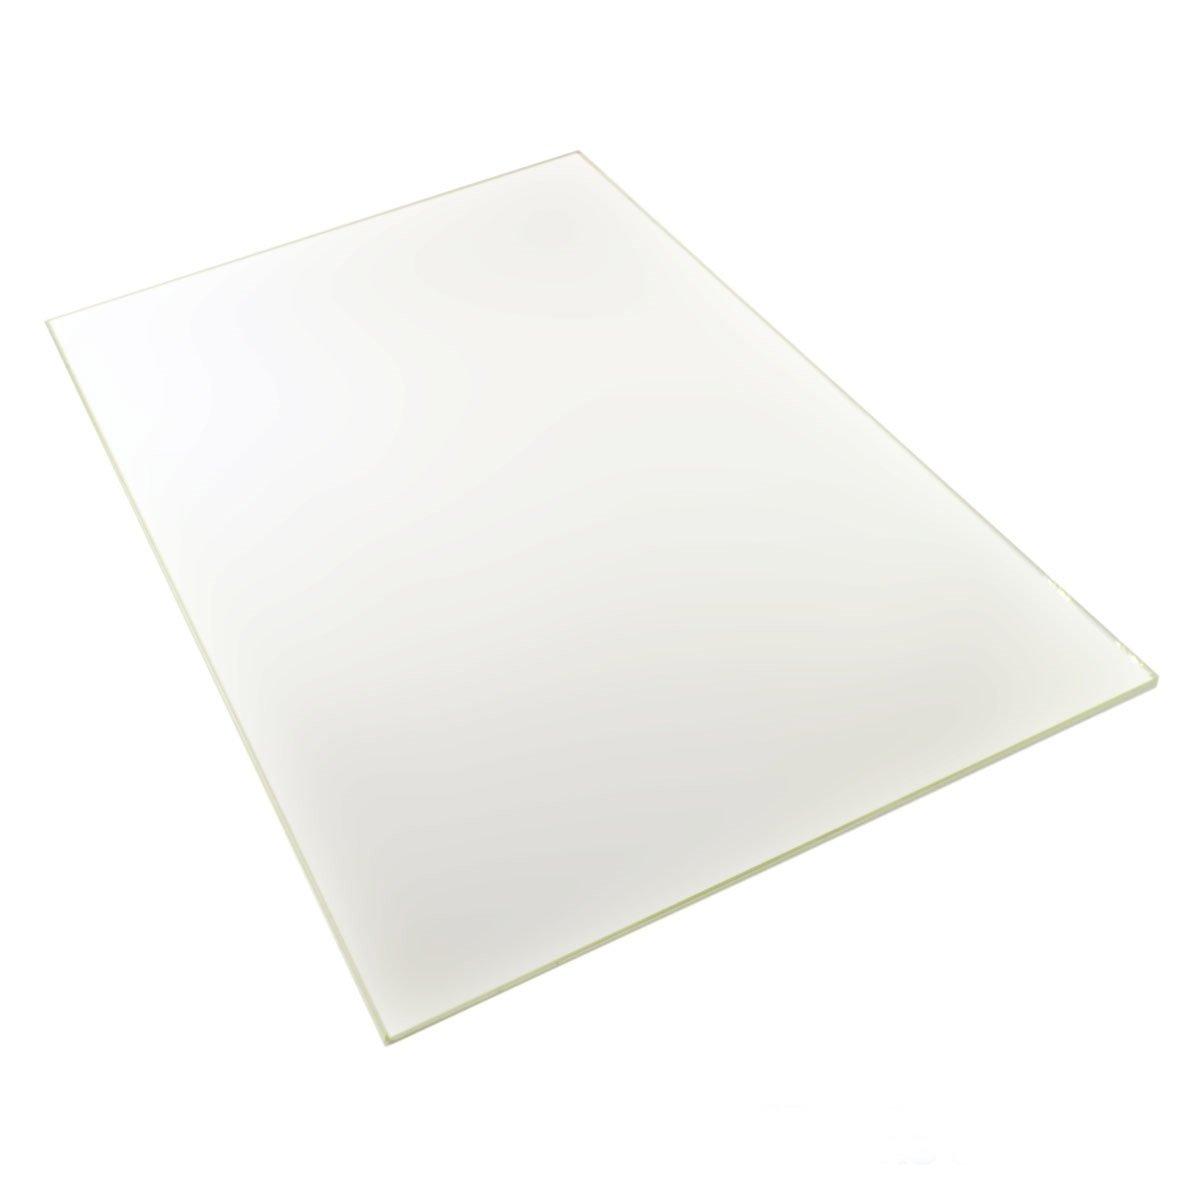 Gulfcoast Robotics] Borosilicate Glass Print Surface 300 x 200 mm ...